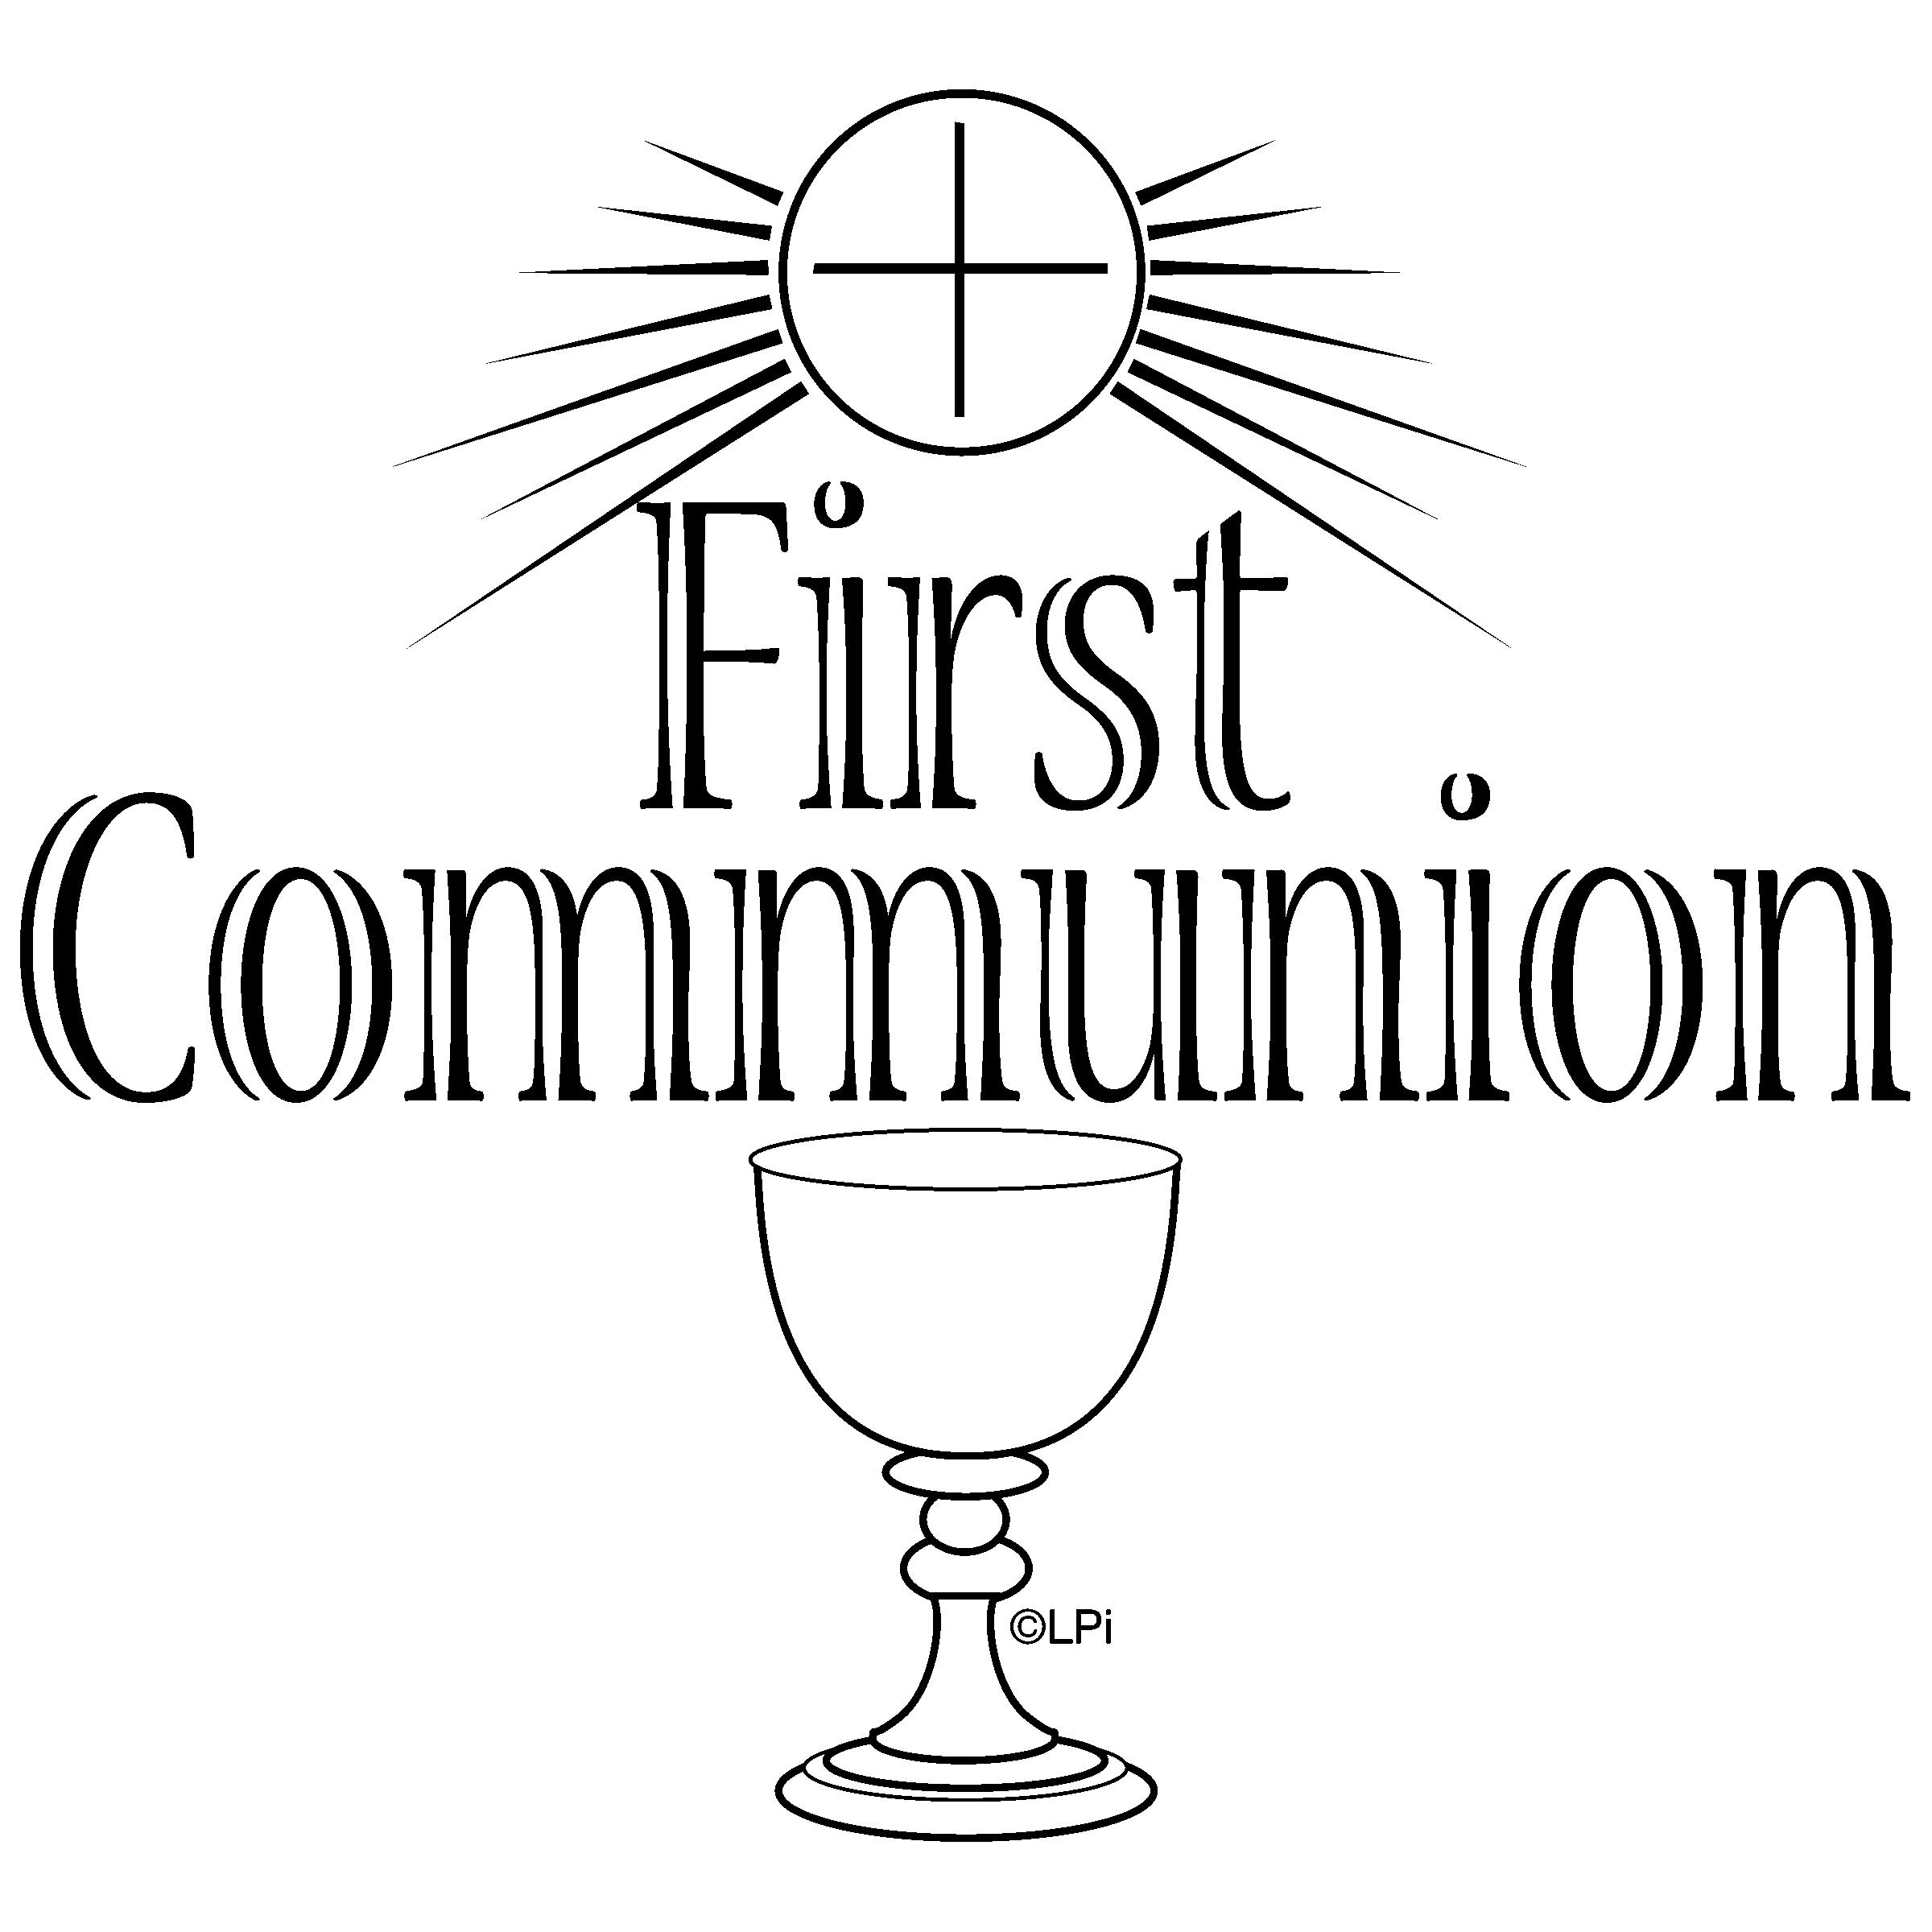 First communion firstmunion clip art clipart